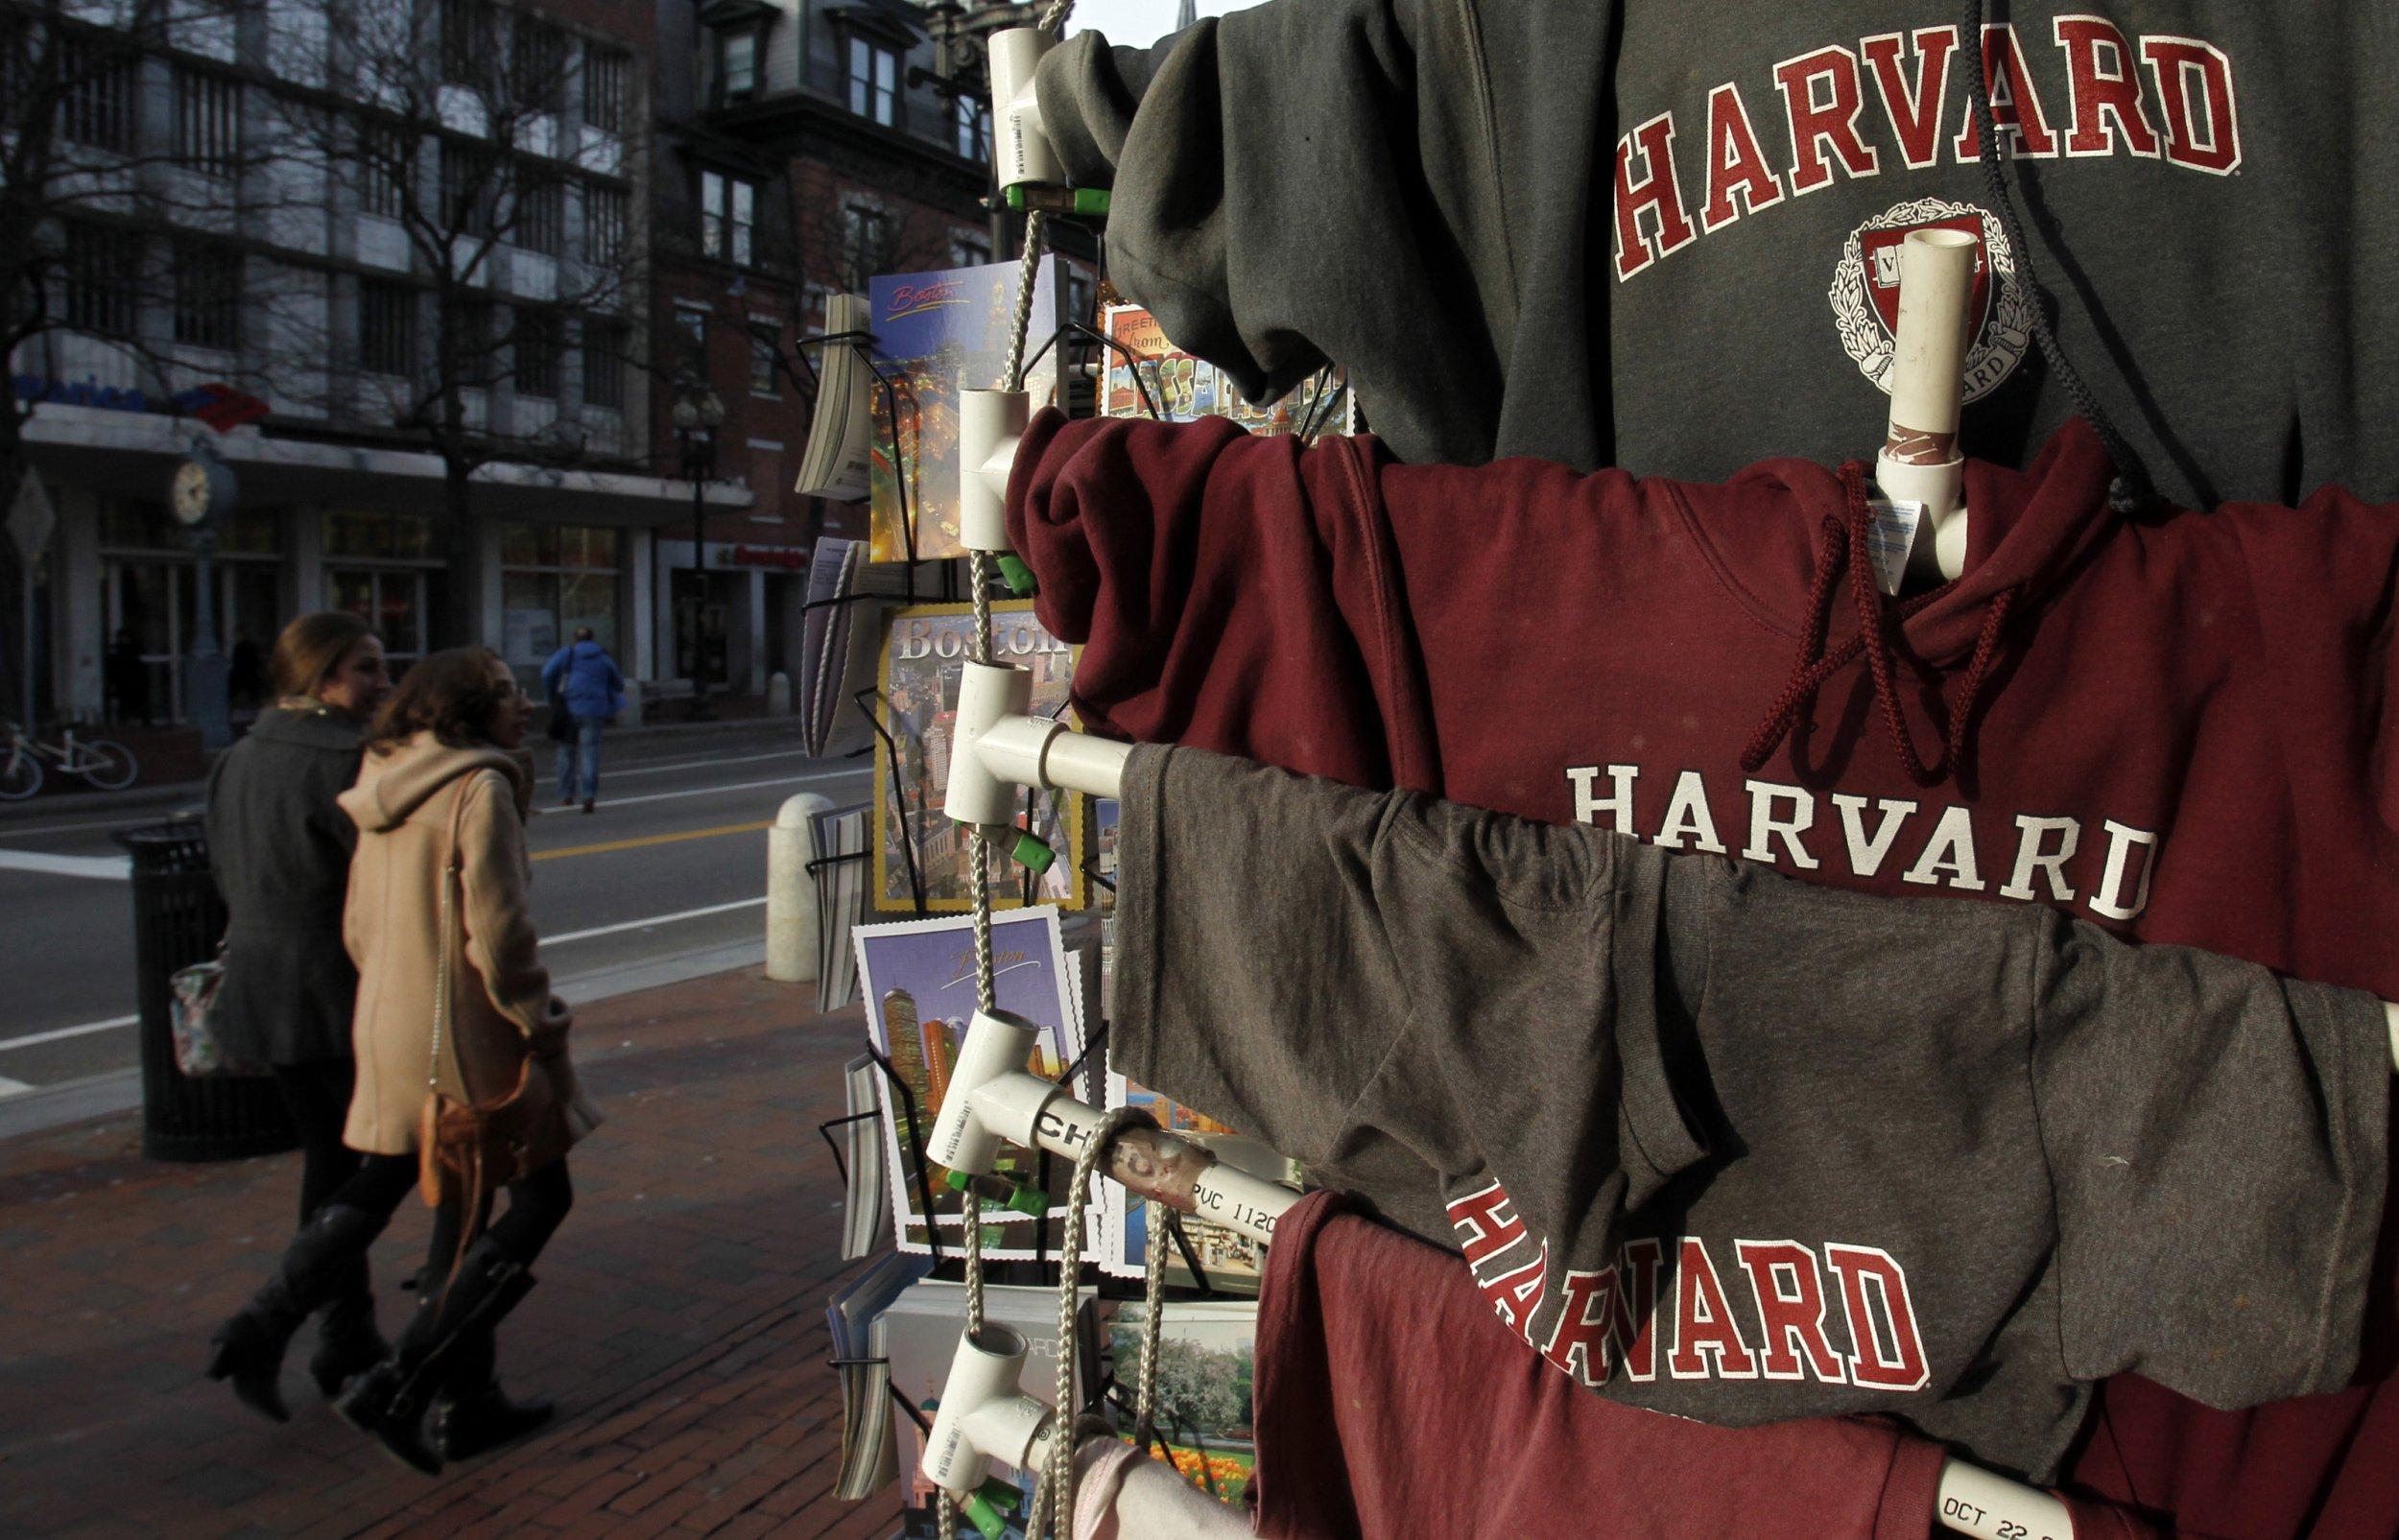 T-shirts for sale at Harvard University.